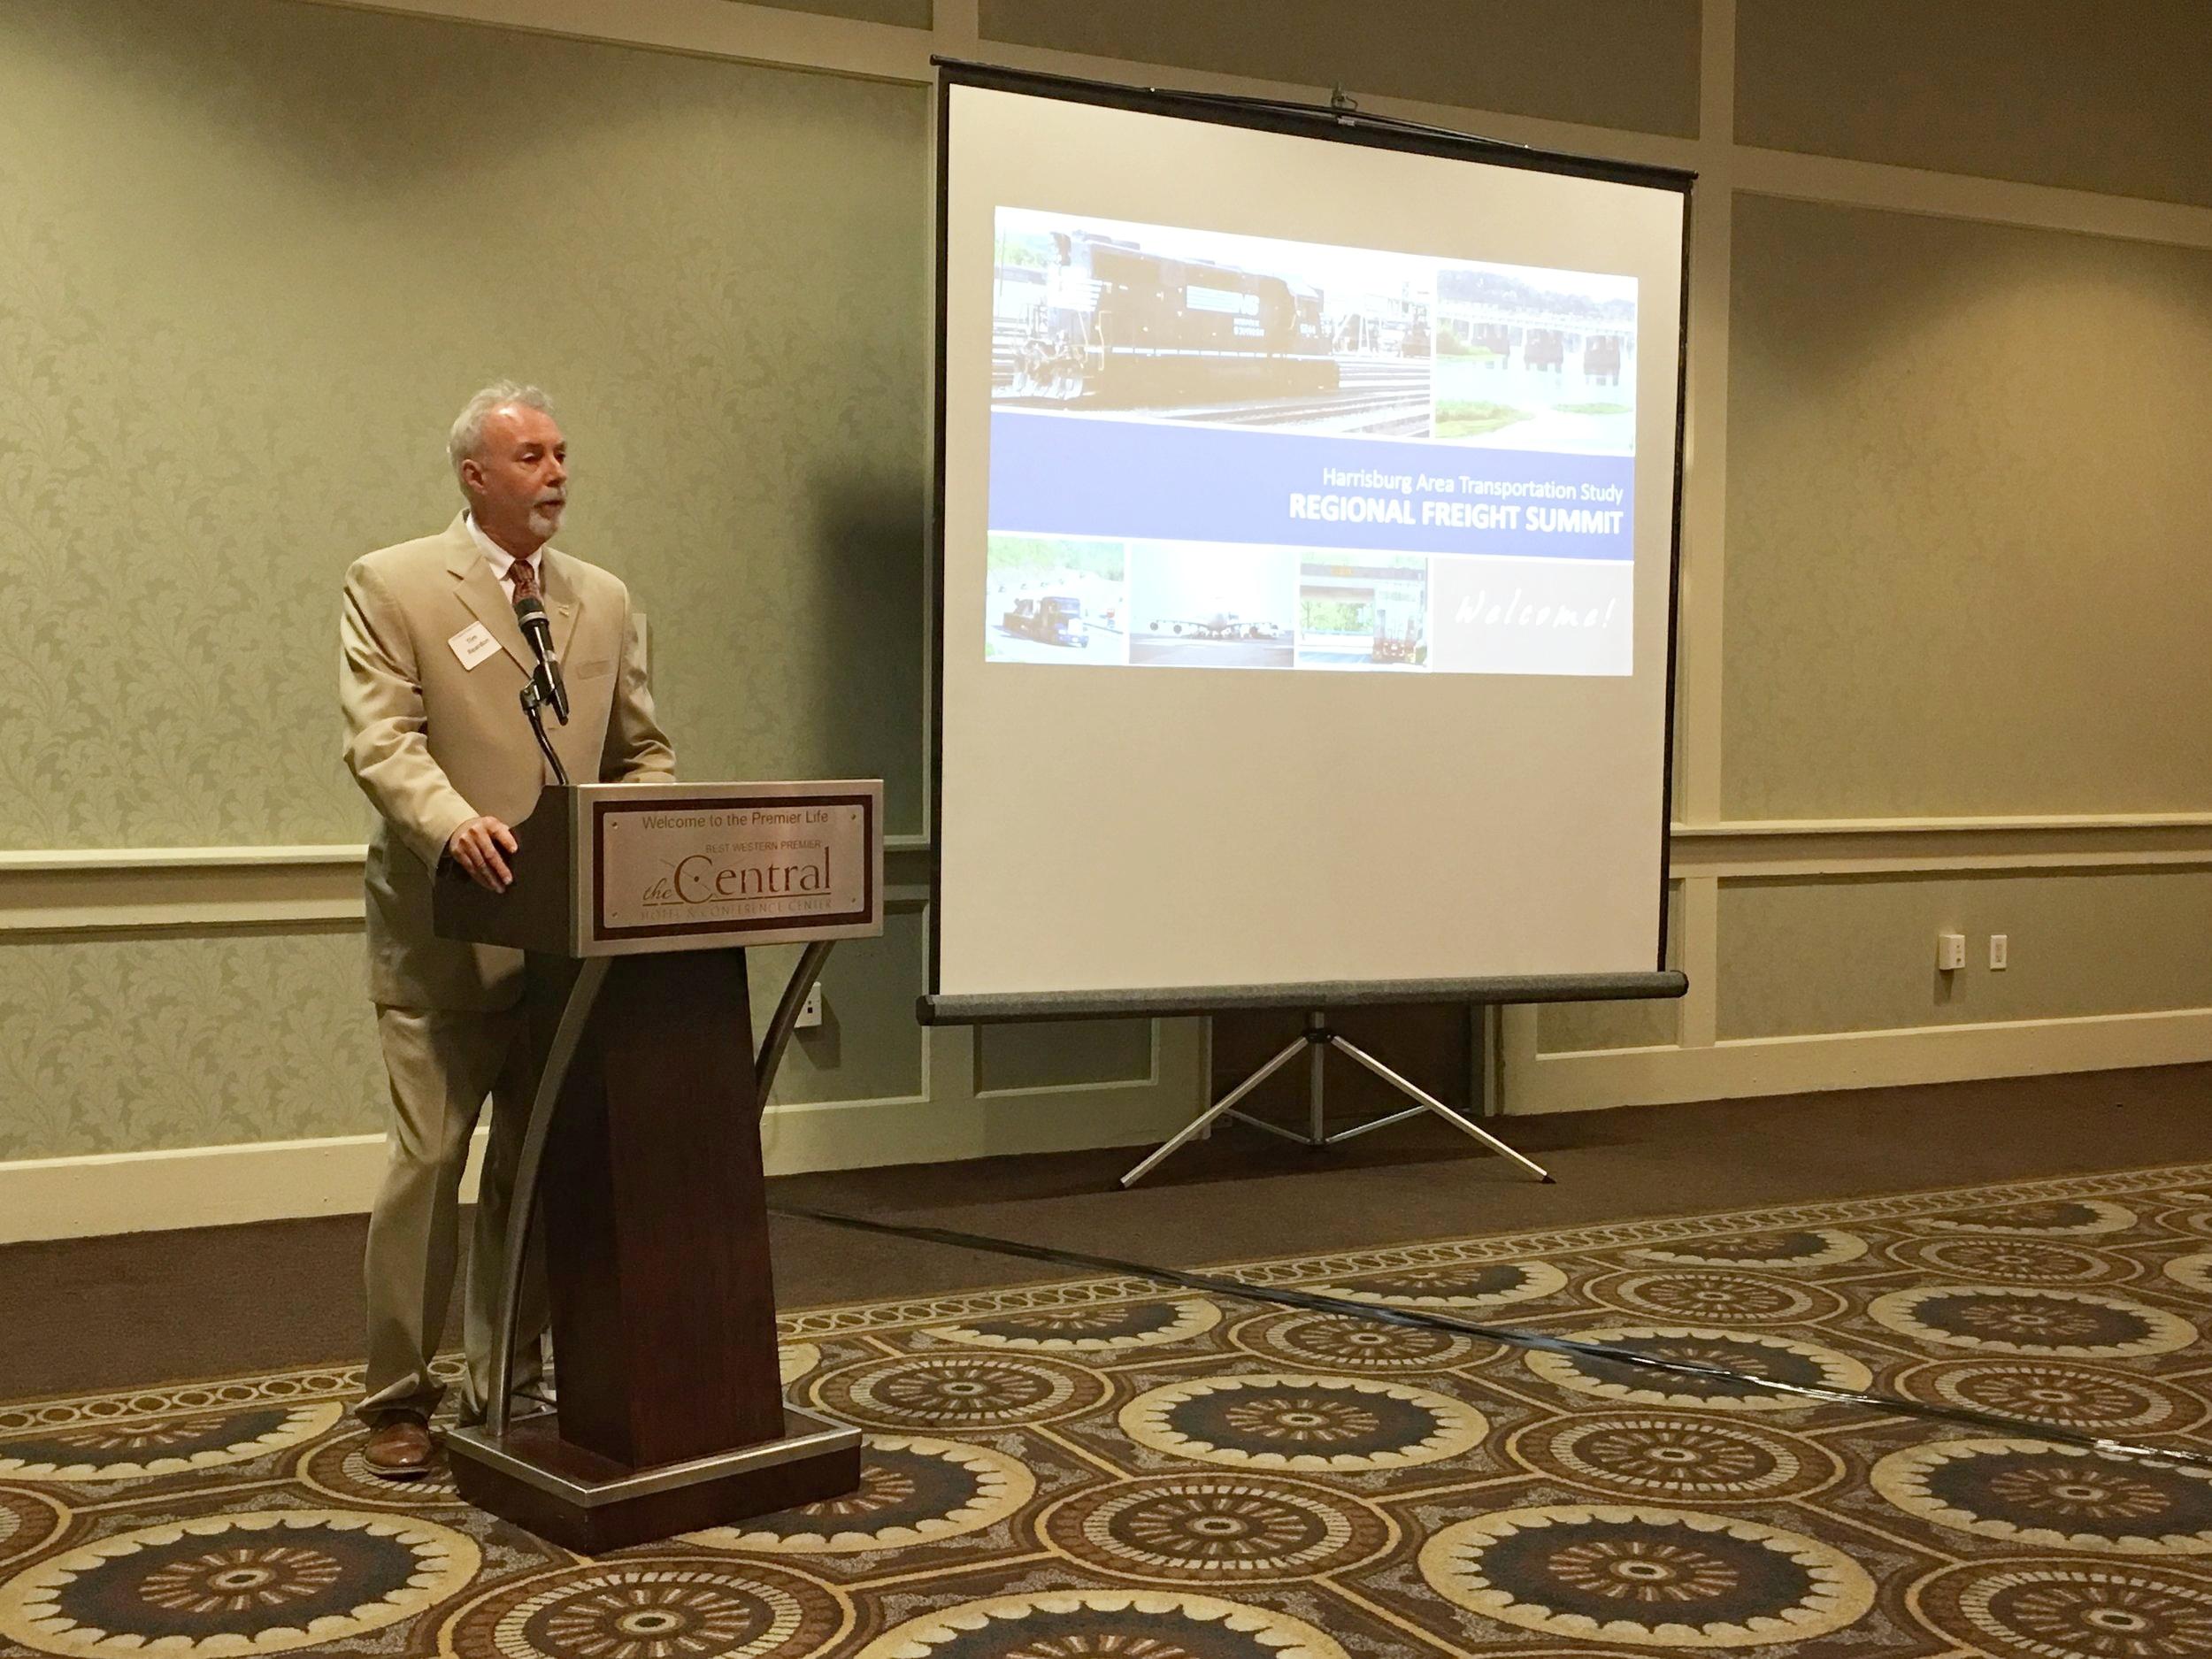 TCRPC Executive Director Tim Reardon opens the Regional Freight Summit.